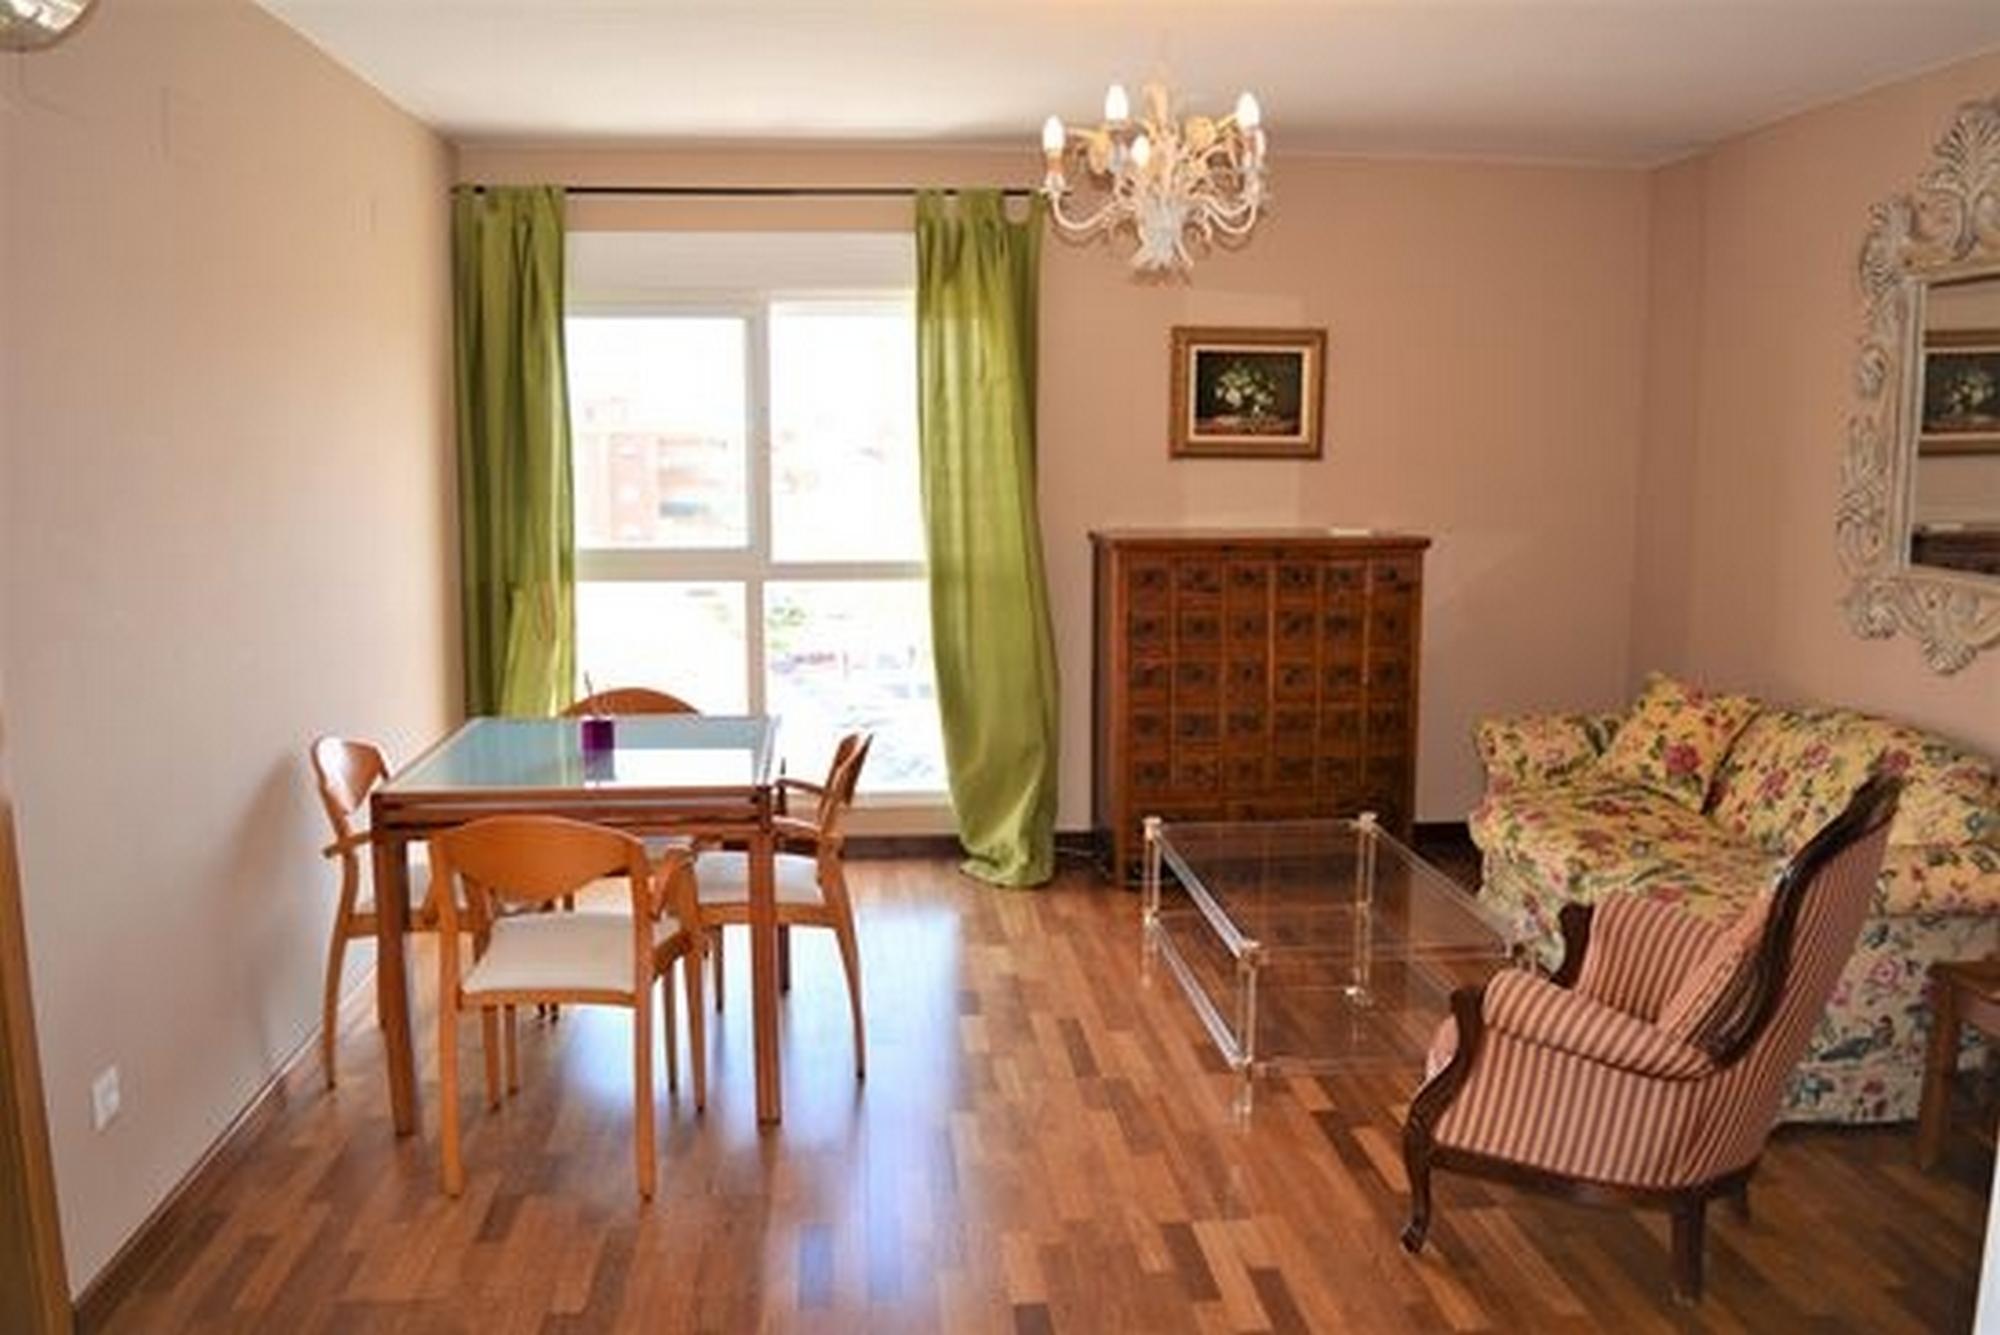 Apartment for rent in Ondara